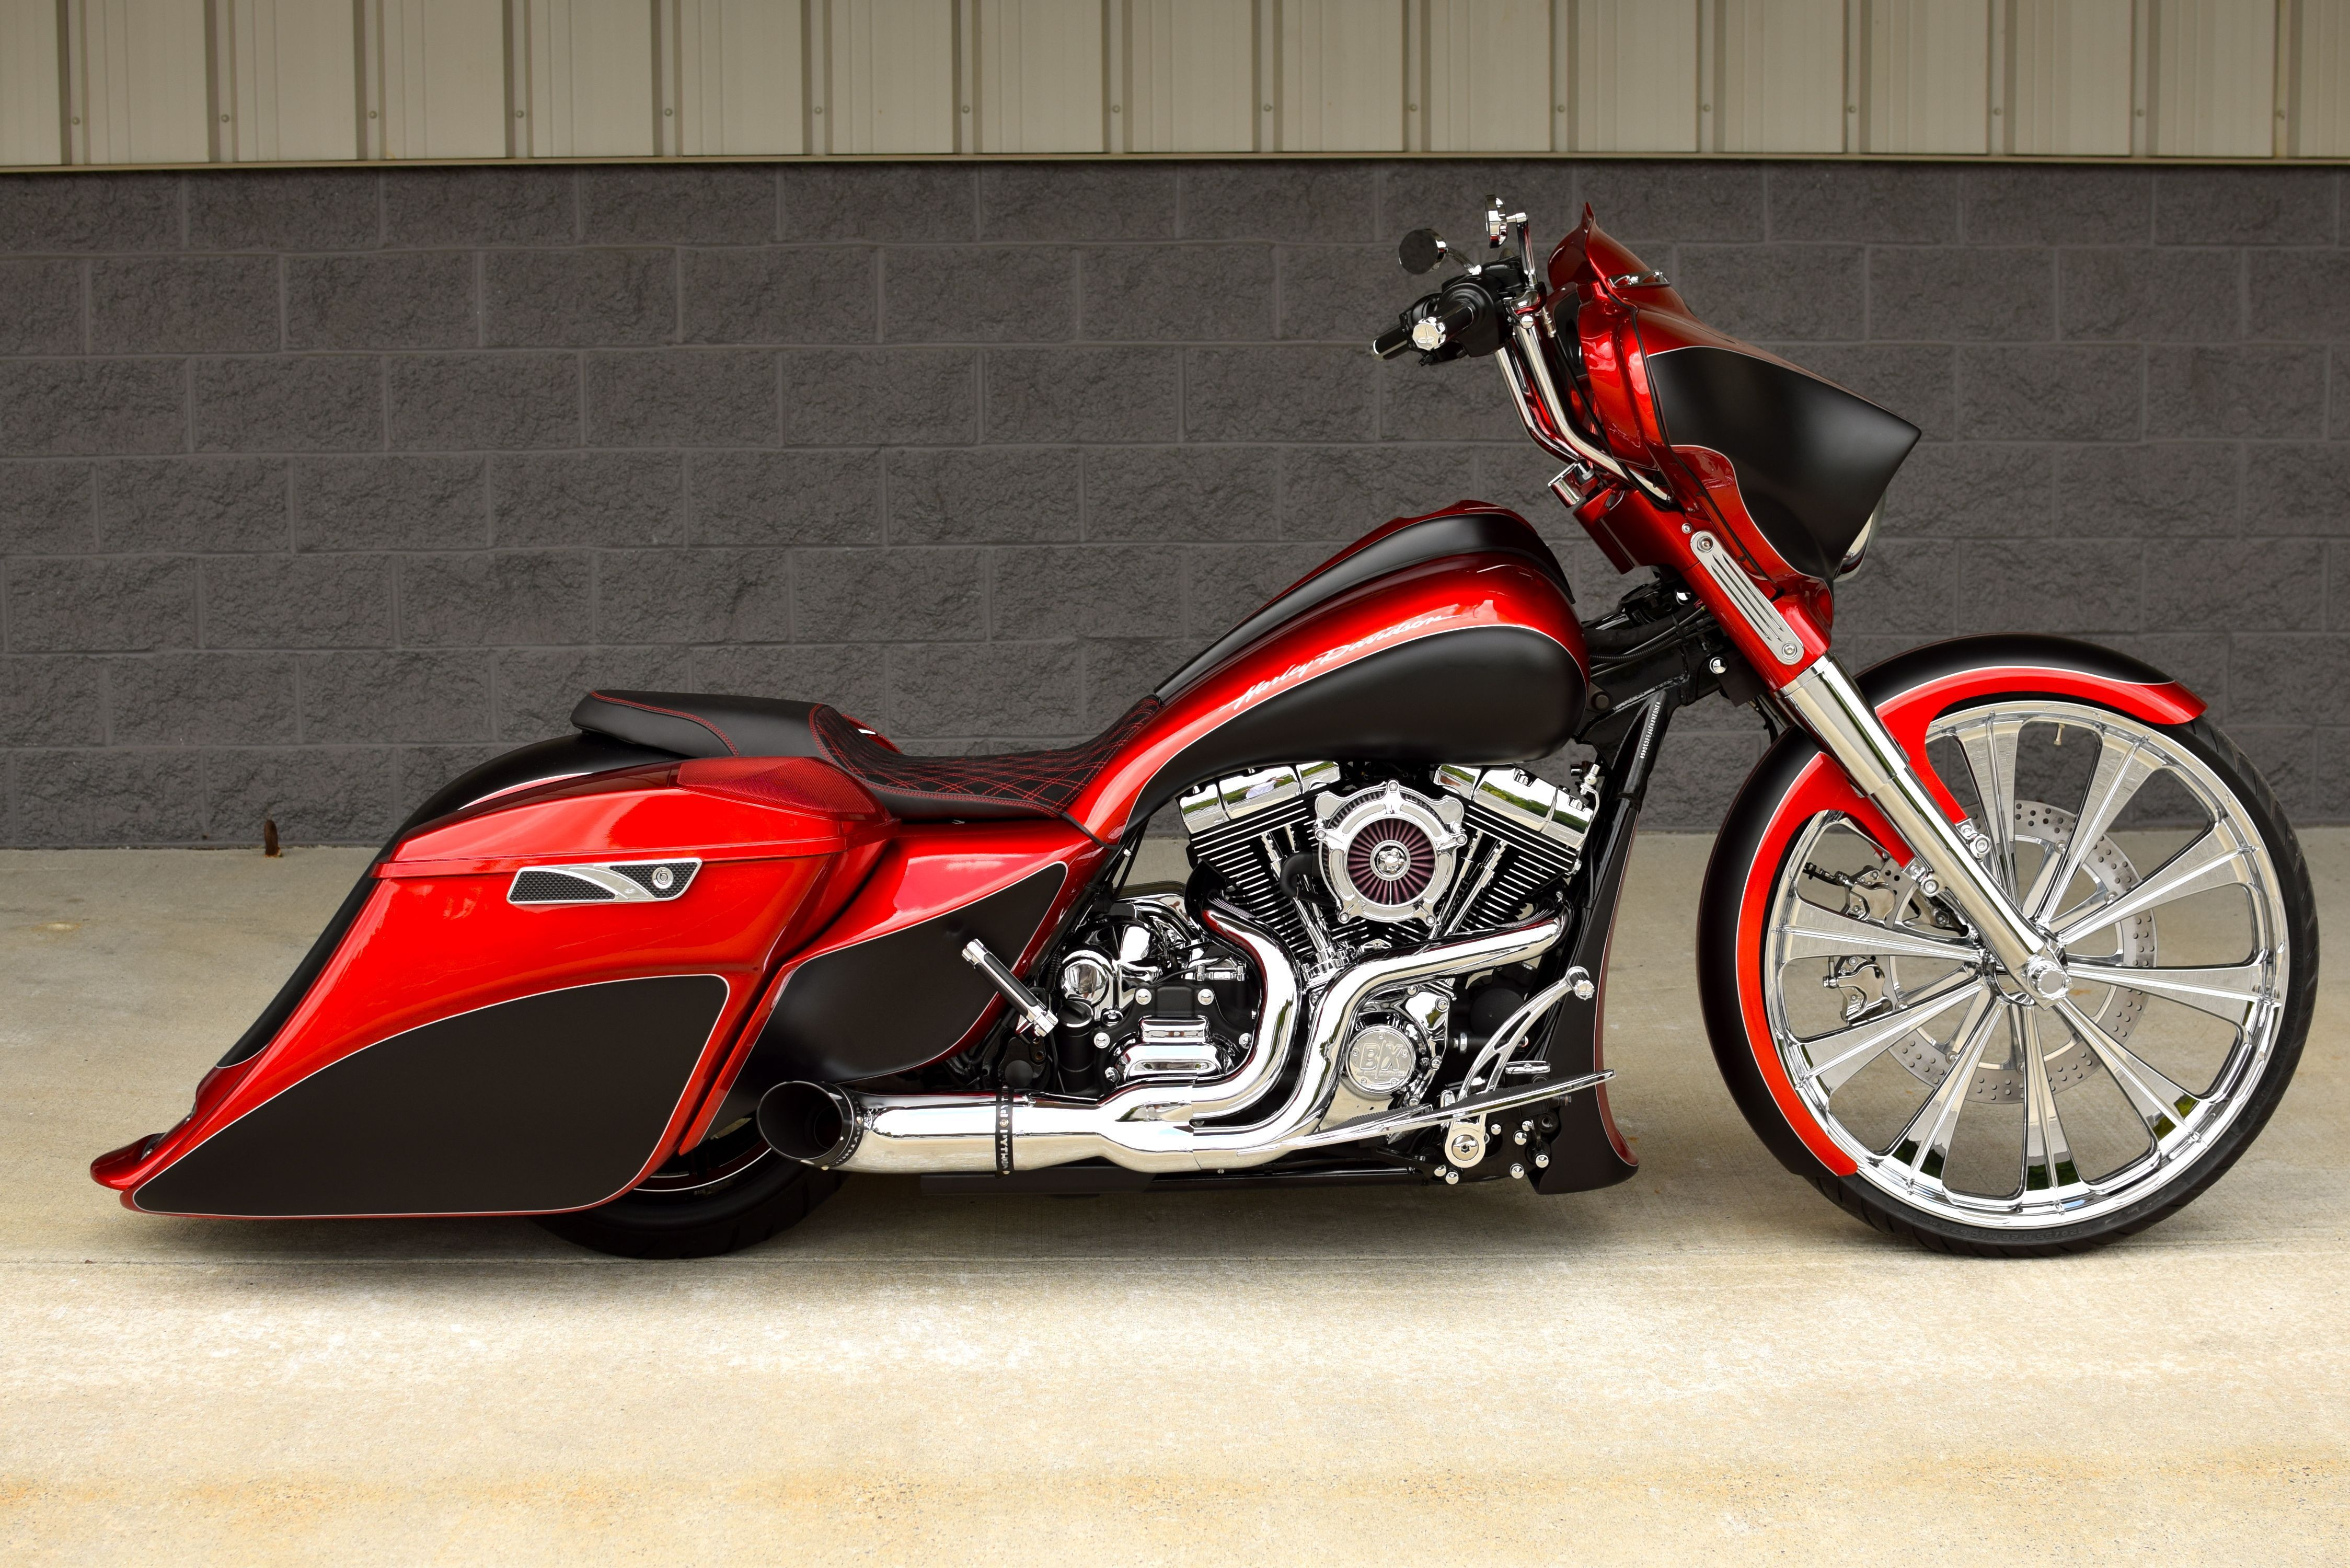 2017 Harley Davidson Street Glide Special 26 Wheel Custom Bagger 23 The Bike Exchange Harleydavidsonstreetglidespecial